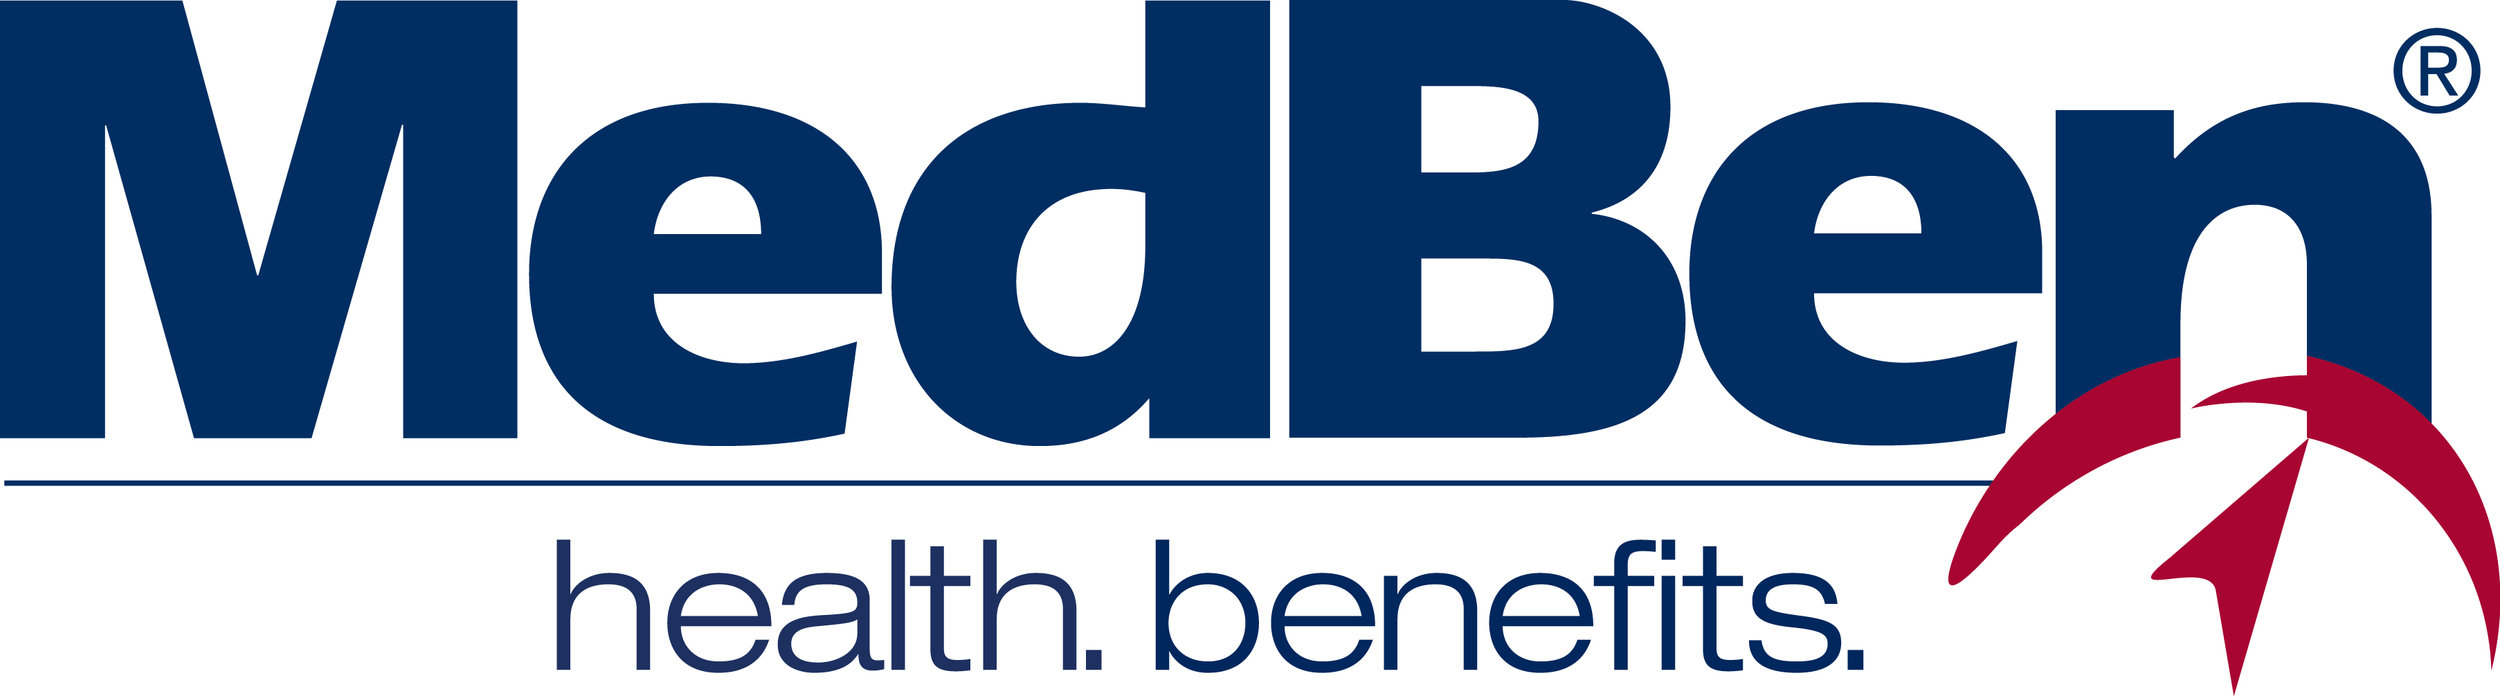 Copy of MedBen Health Benefits Logo, Color smaller.jpg